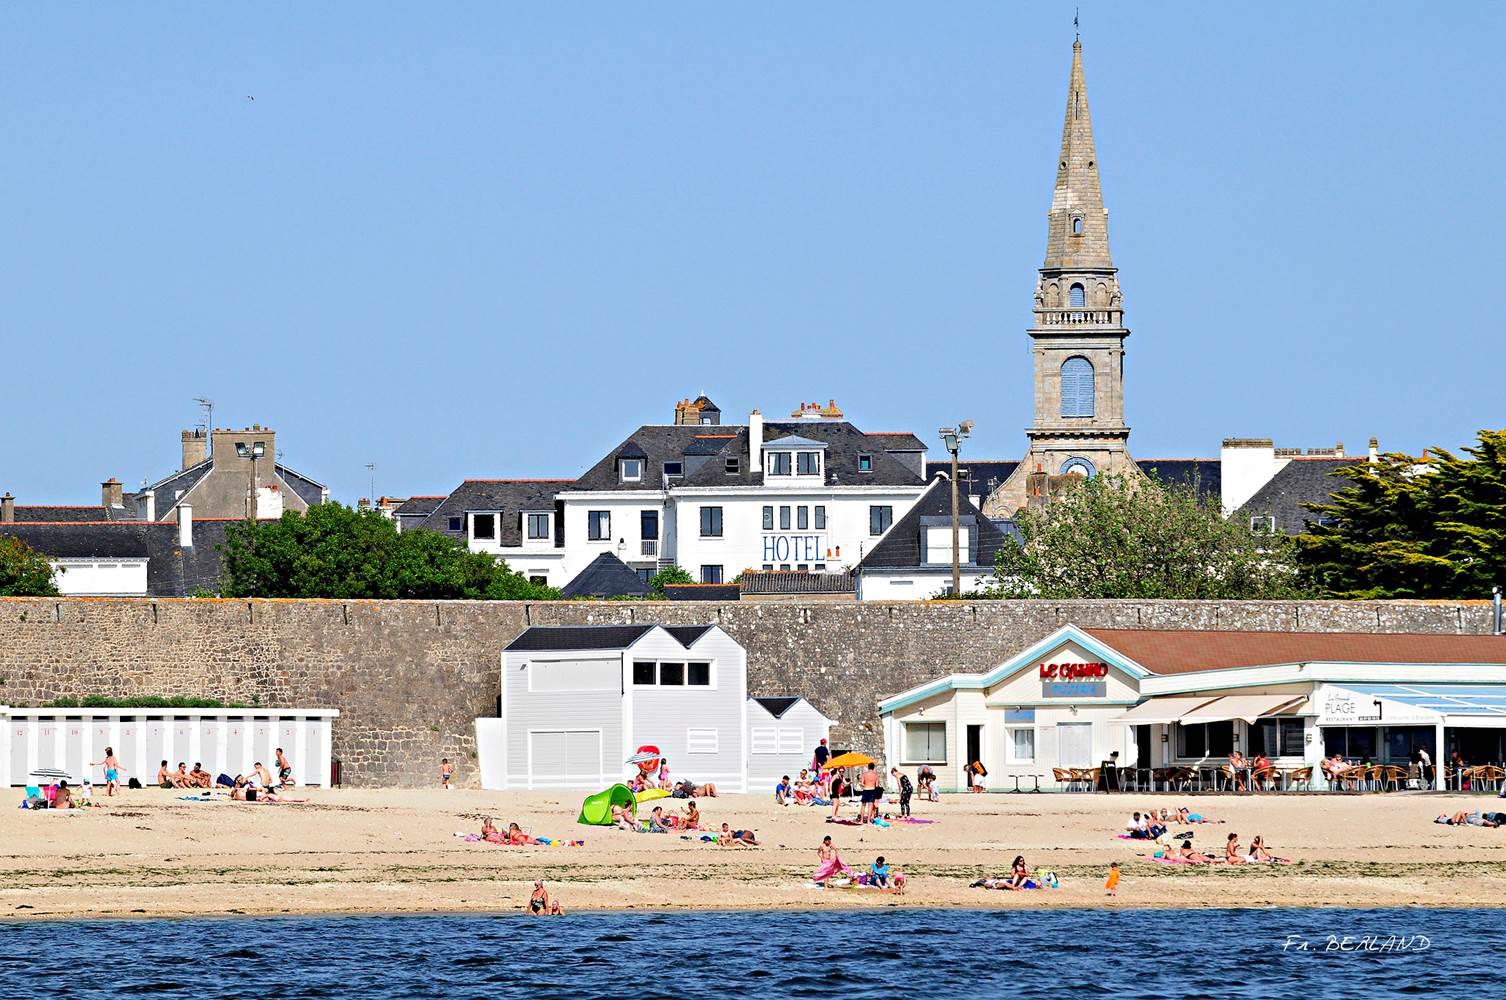 Hotel de la Citadelle - Bretagne sud - Lorient - Port Louis - Hotel vue de la plage ©